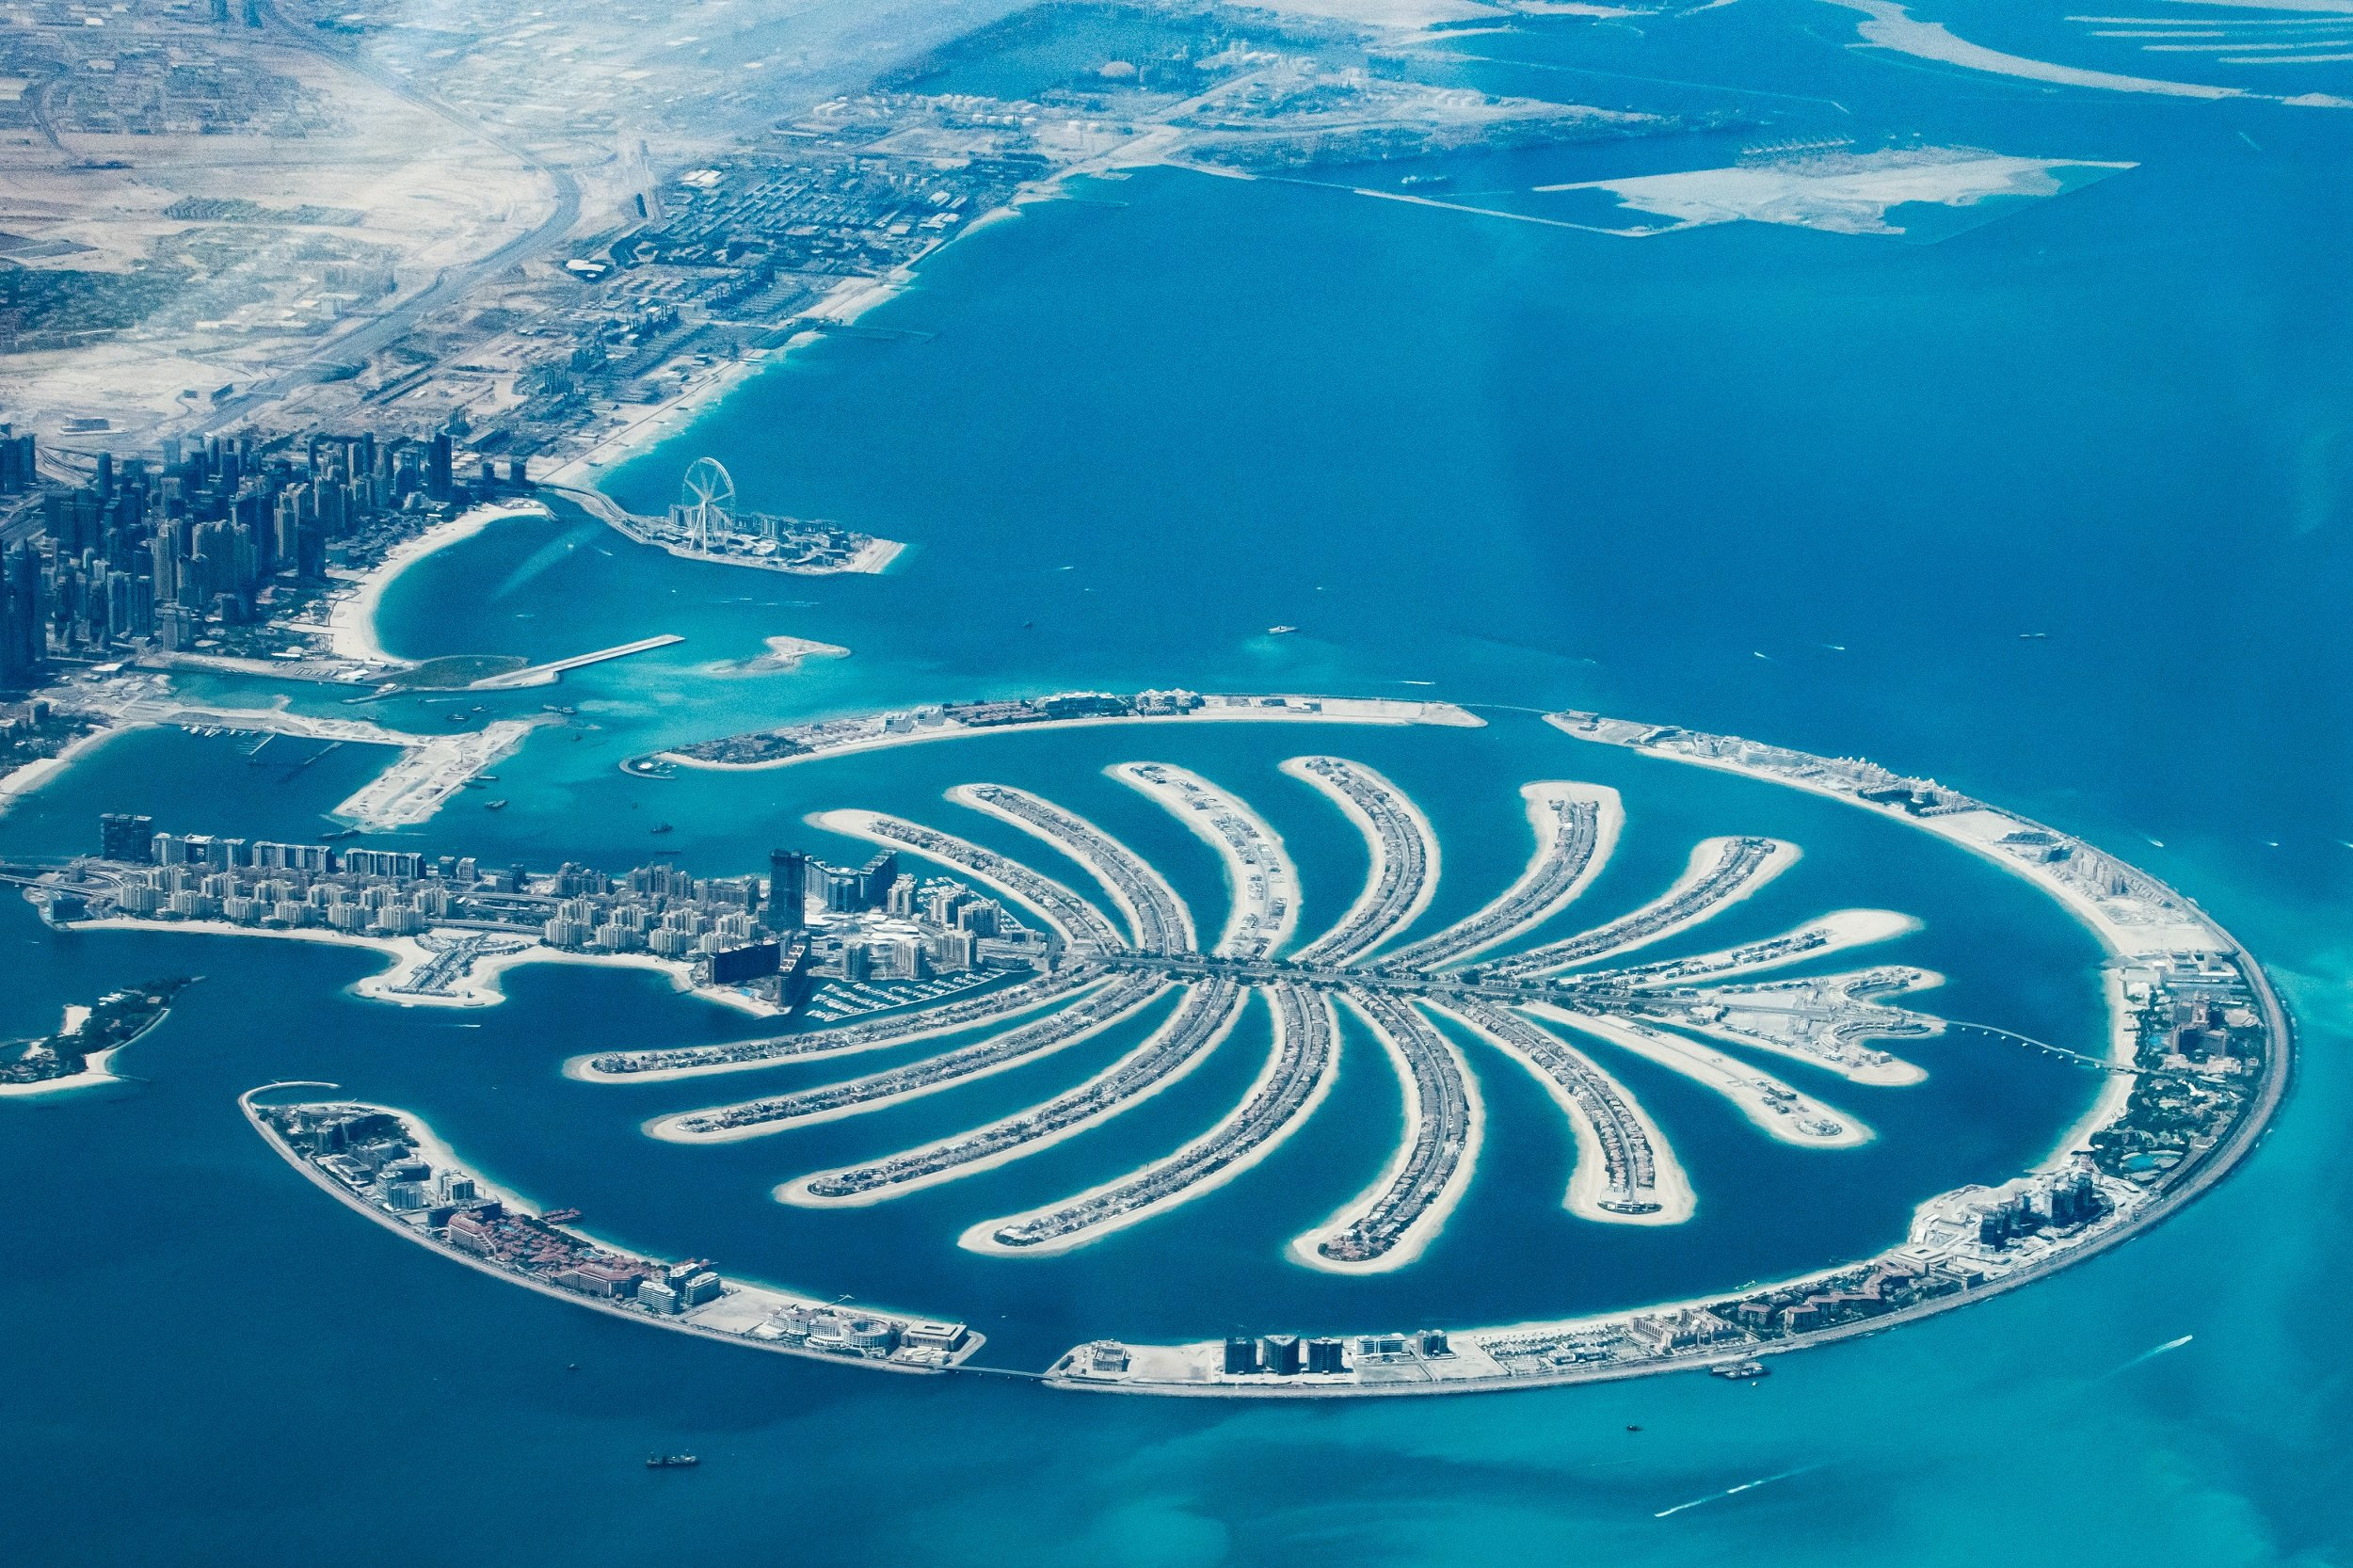 Dubai & Abu Dhabi 5 Day City Break Tour Package_4